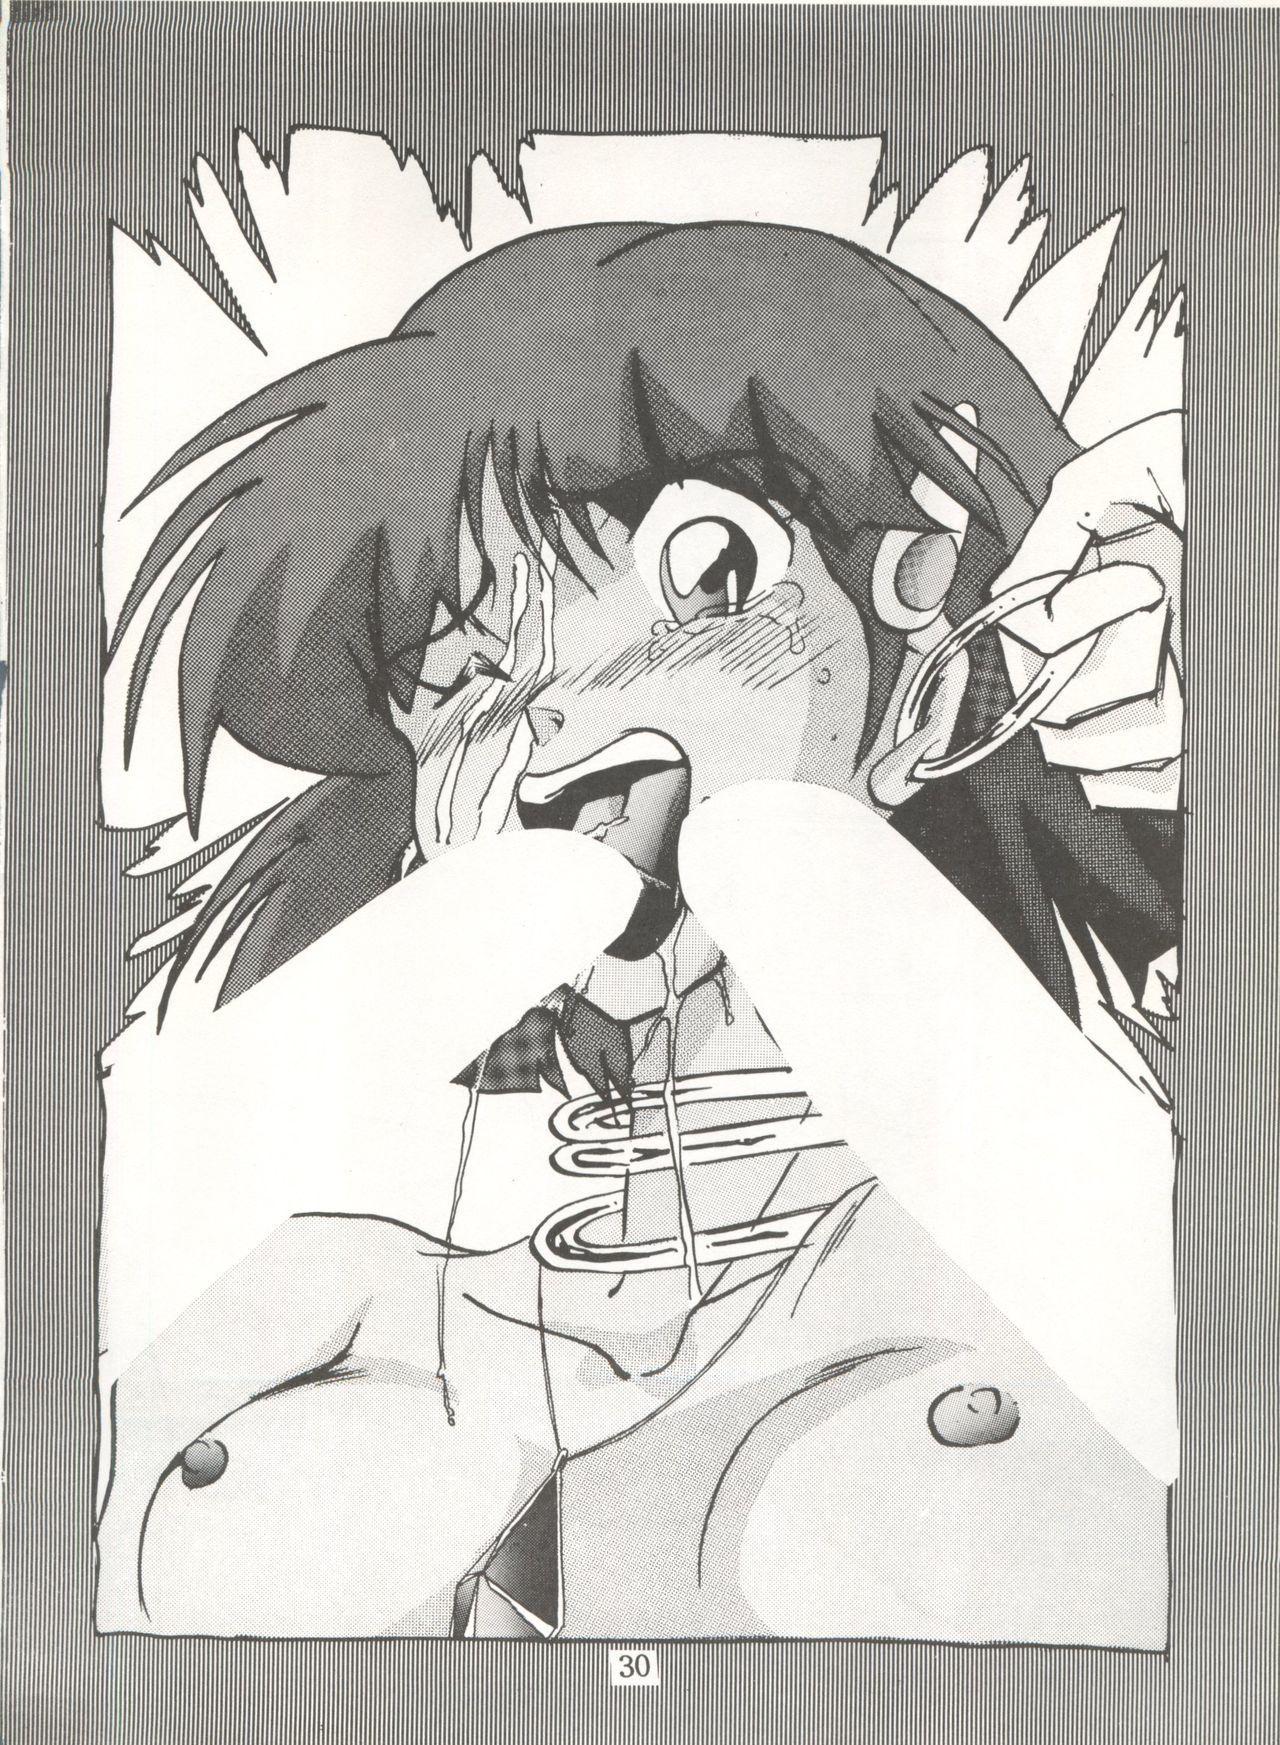 [Global One (MARO)] Sadistic 5 (Cutey Honey, Devilman, Sailor Moon), [Global One (MARO)] Sadistic (Dirty Pair, Fushigi no Umi no Nadia, Sailor Moon), [Studio Ikkatsumajin] .ribbon (Hime-chan's Ribbon) 89